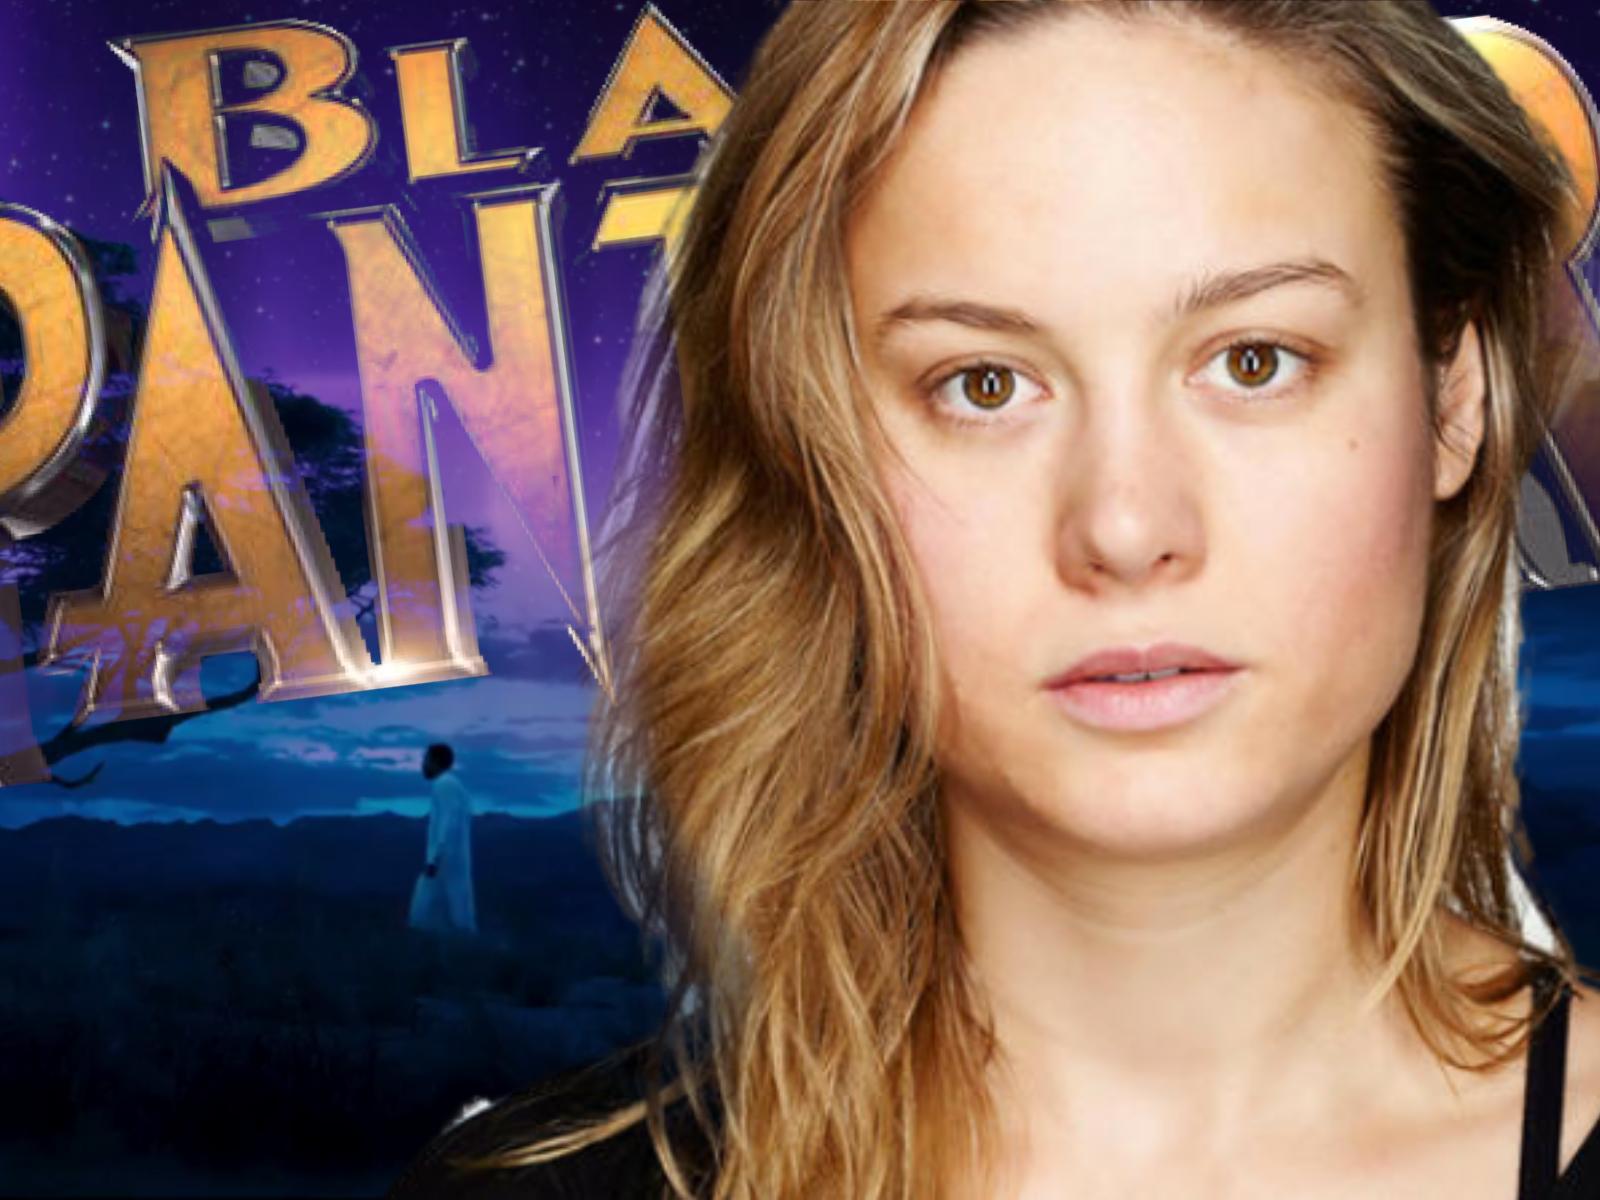 captain marvel actress